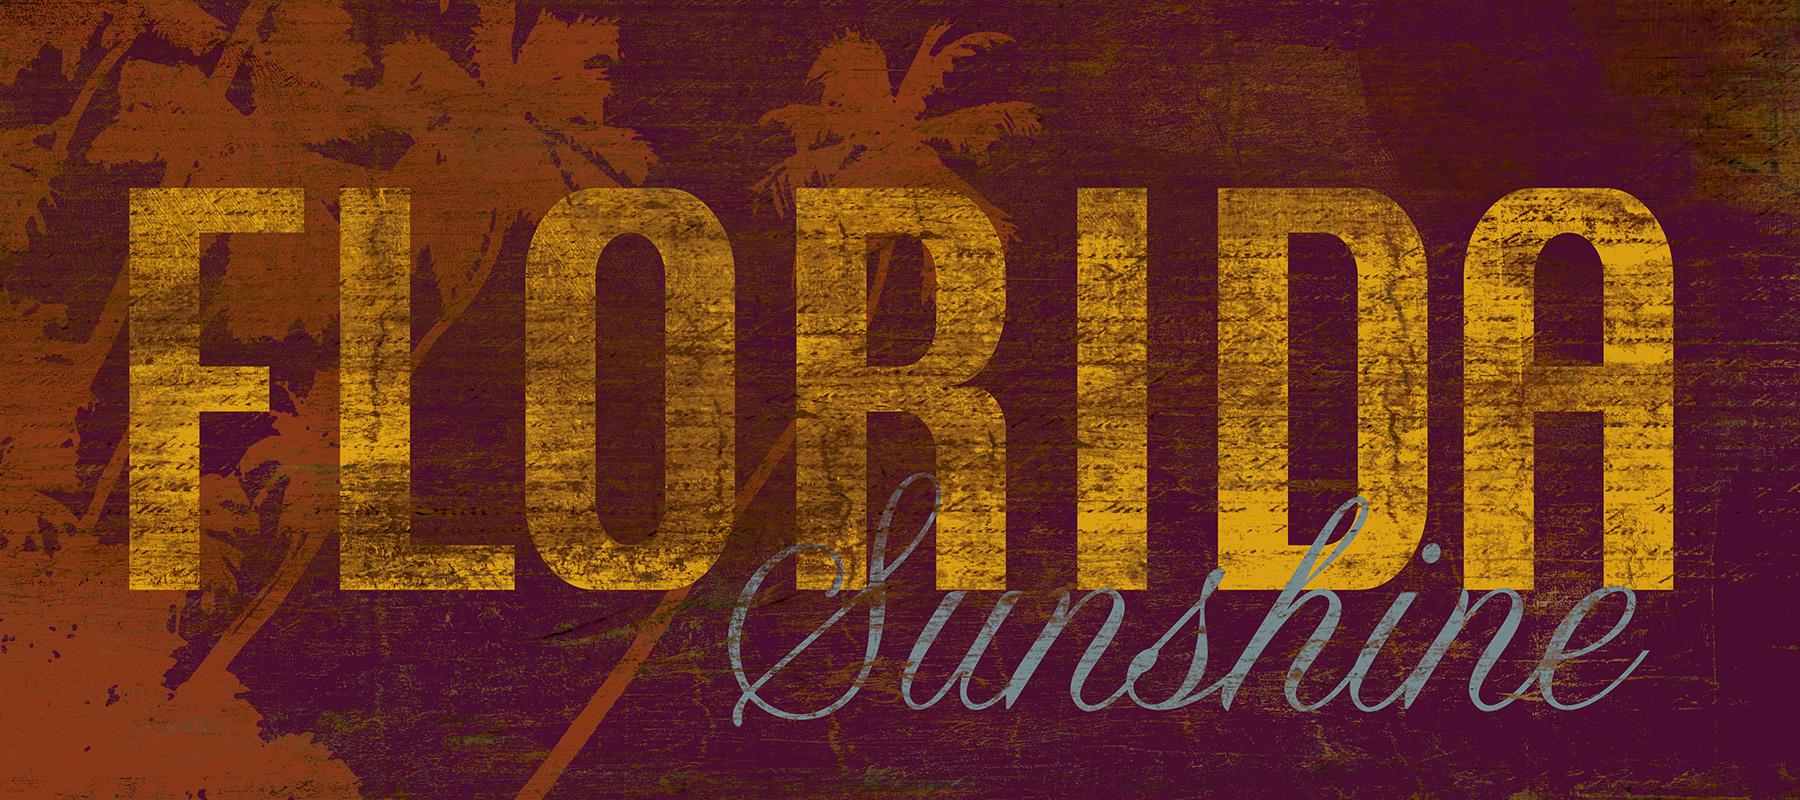 CSteffen_Florida Sunshine.jpg